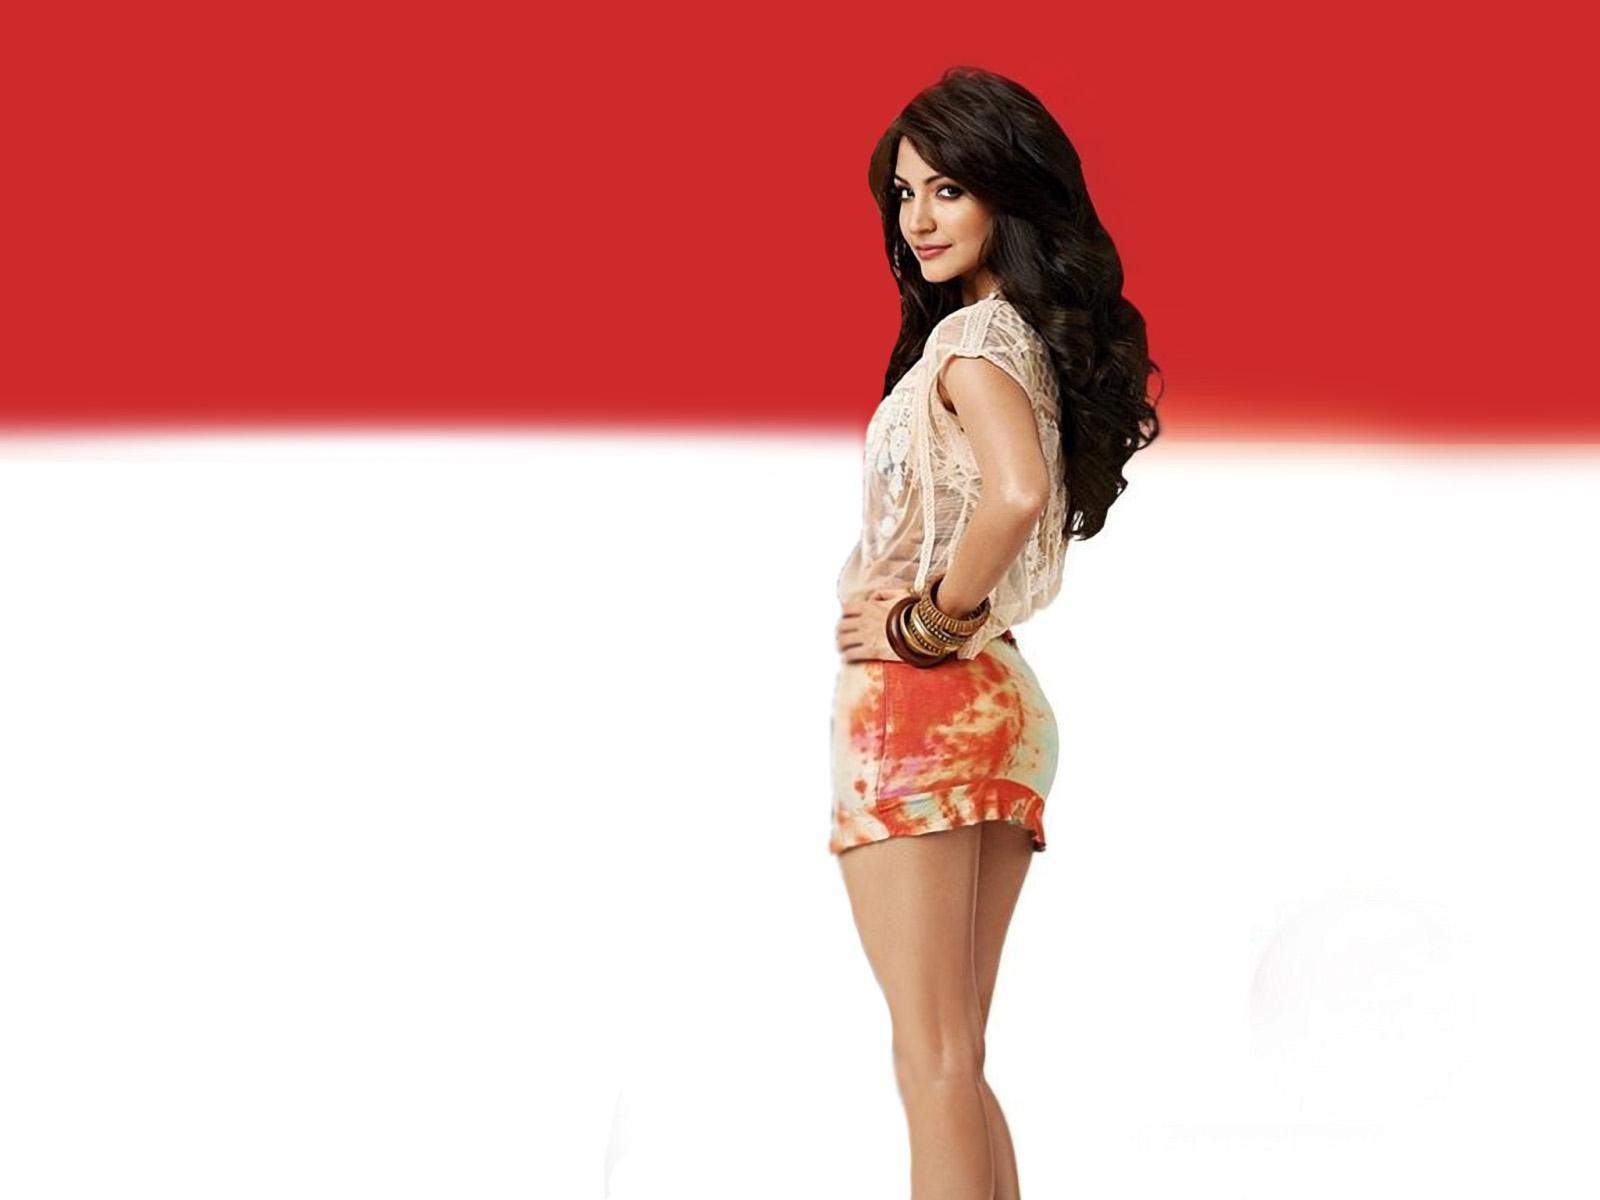 anushka sharma topless pics free download